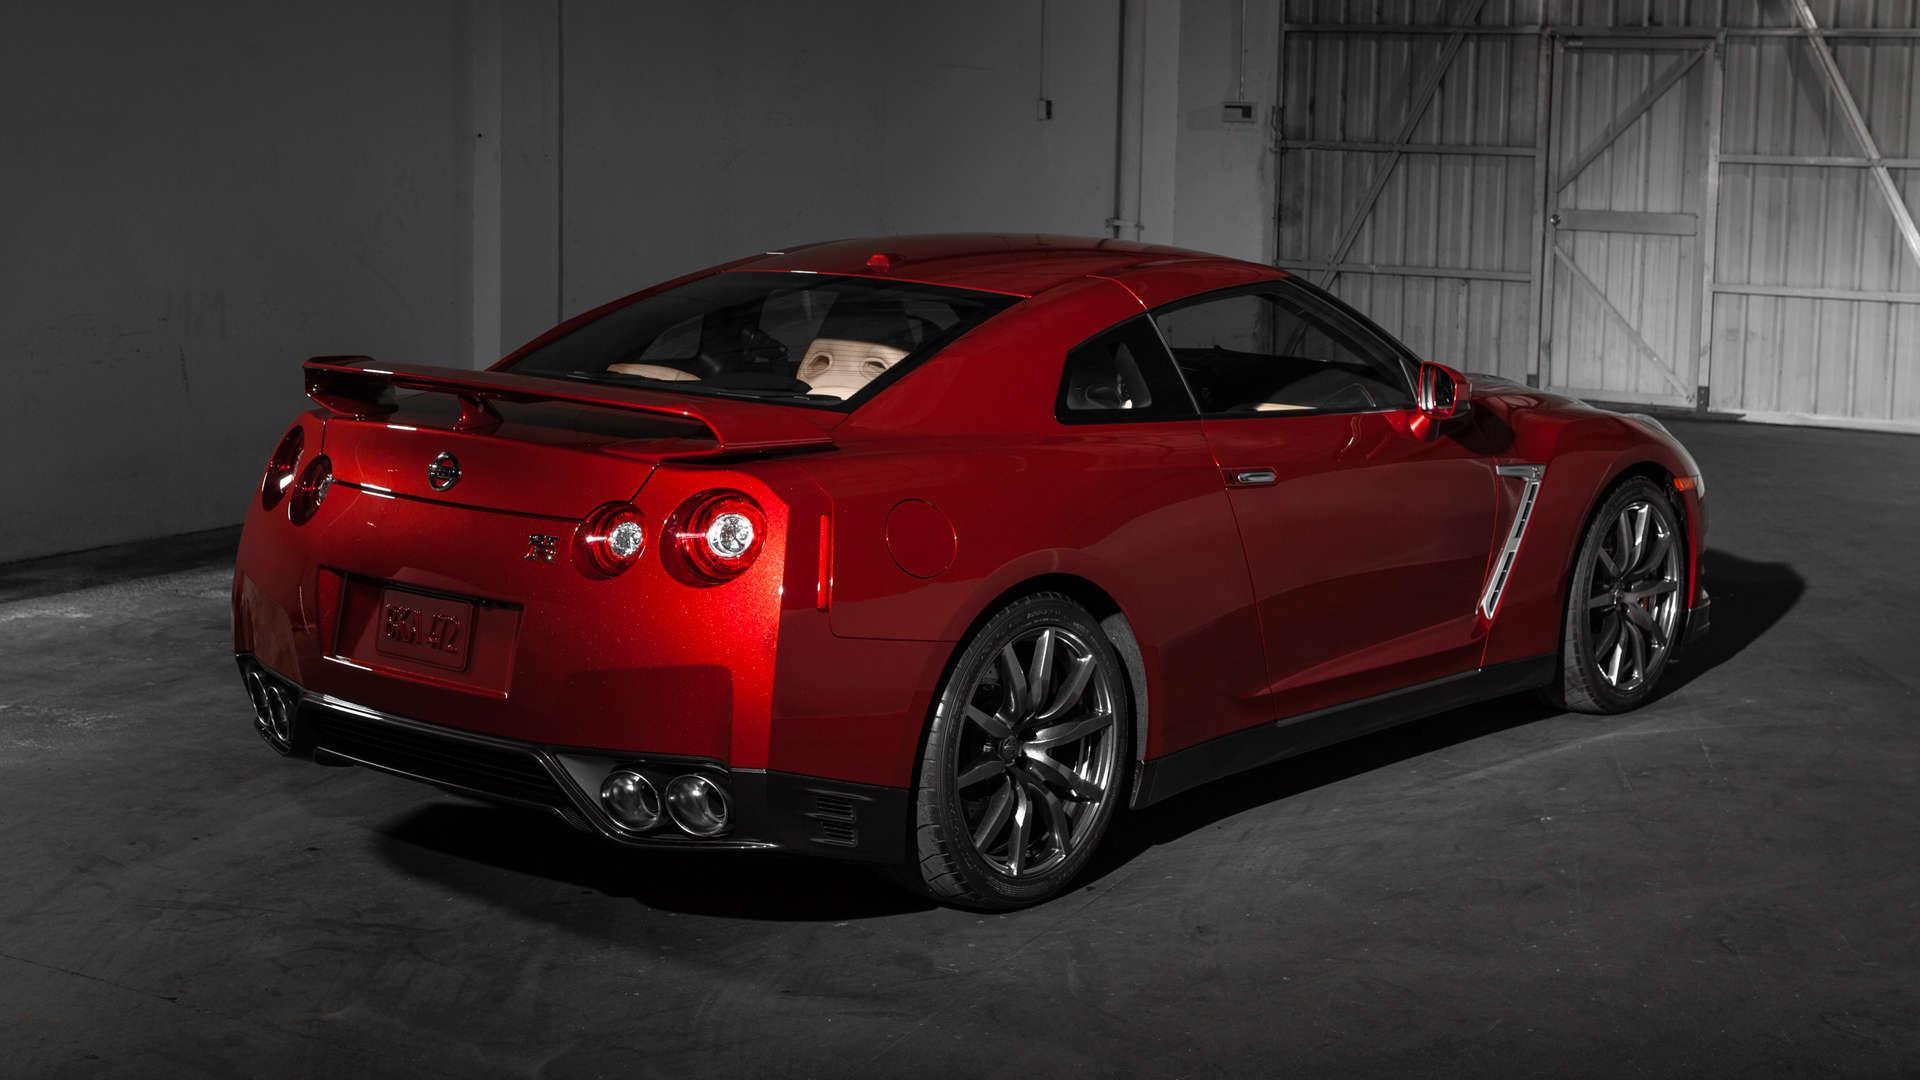 Nissan GT R Wallpaper HD - WallpaperSafari